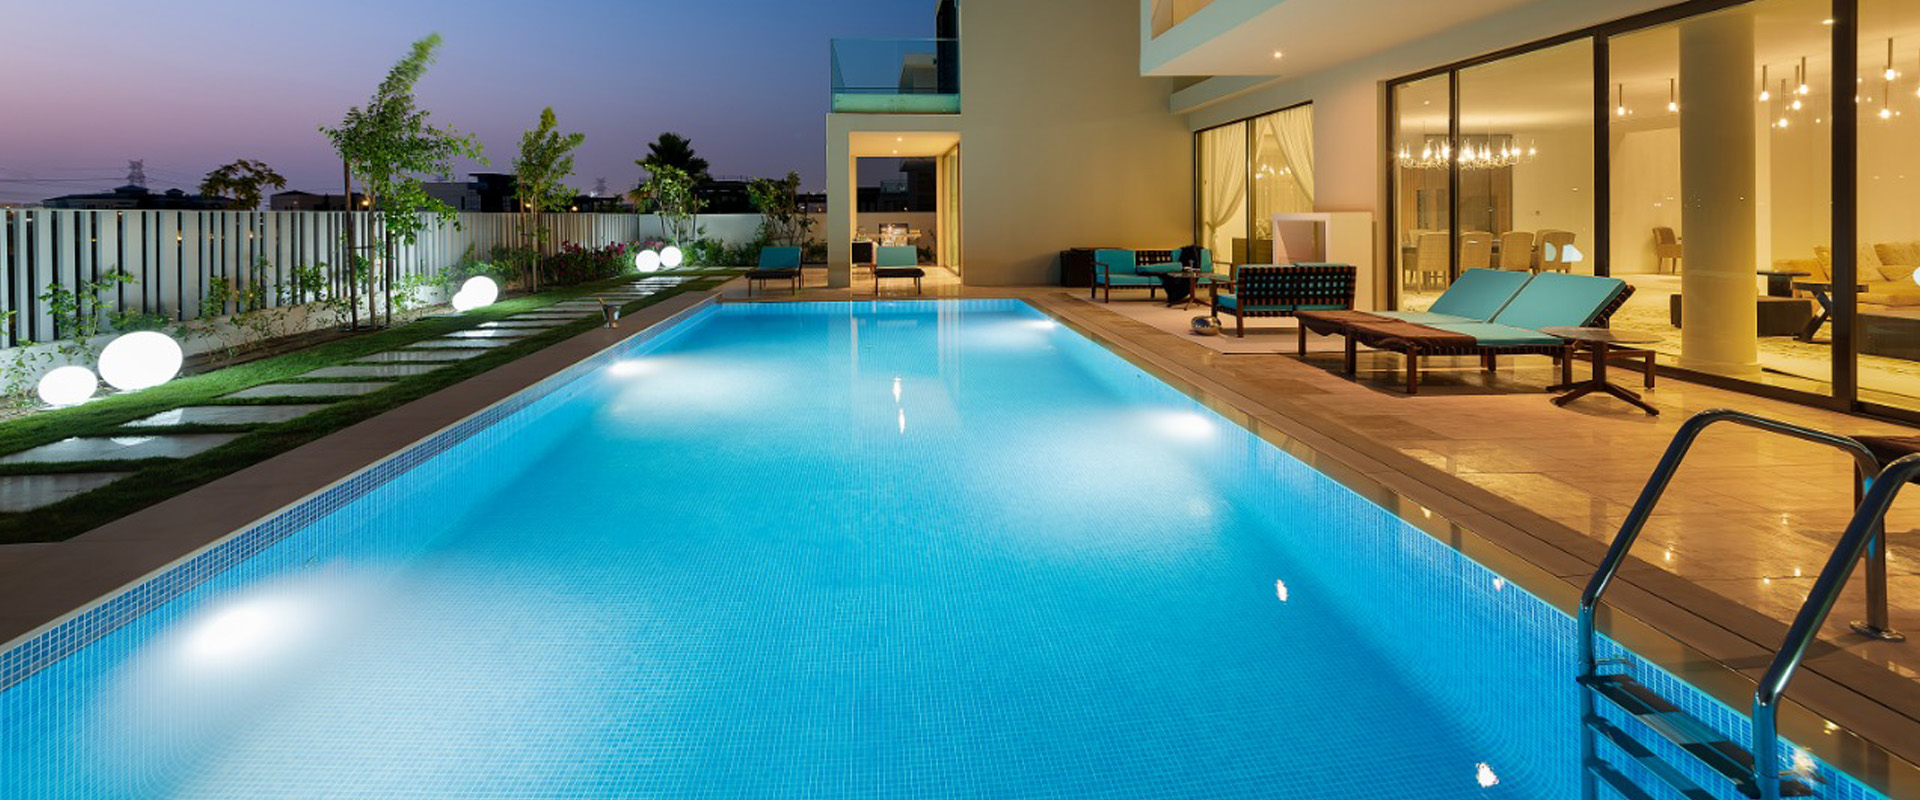 parkway-and-fairway-pool-by-desert-leisure